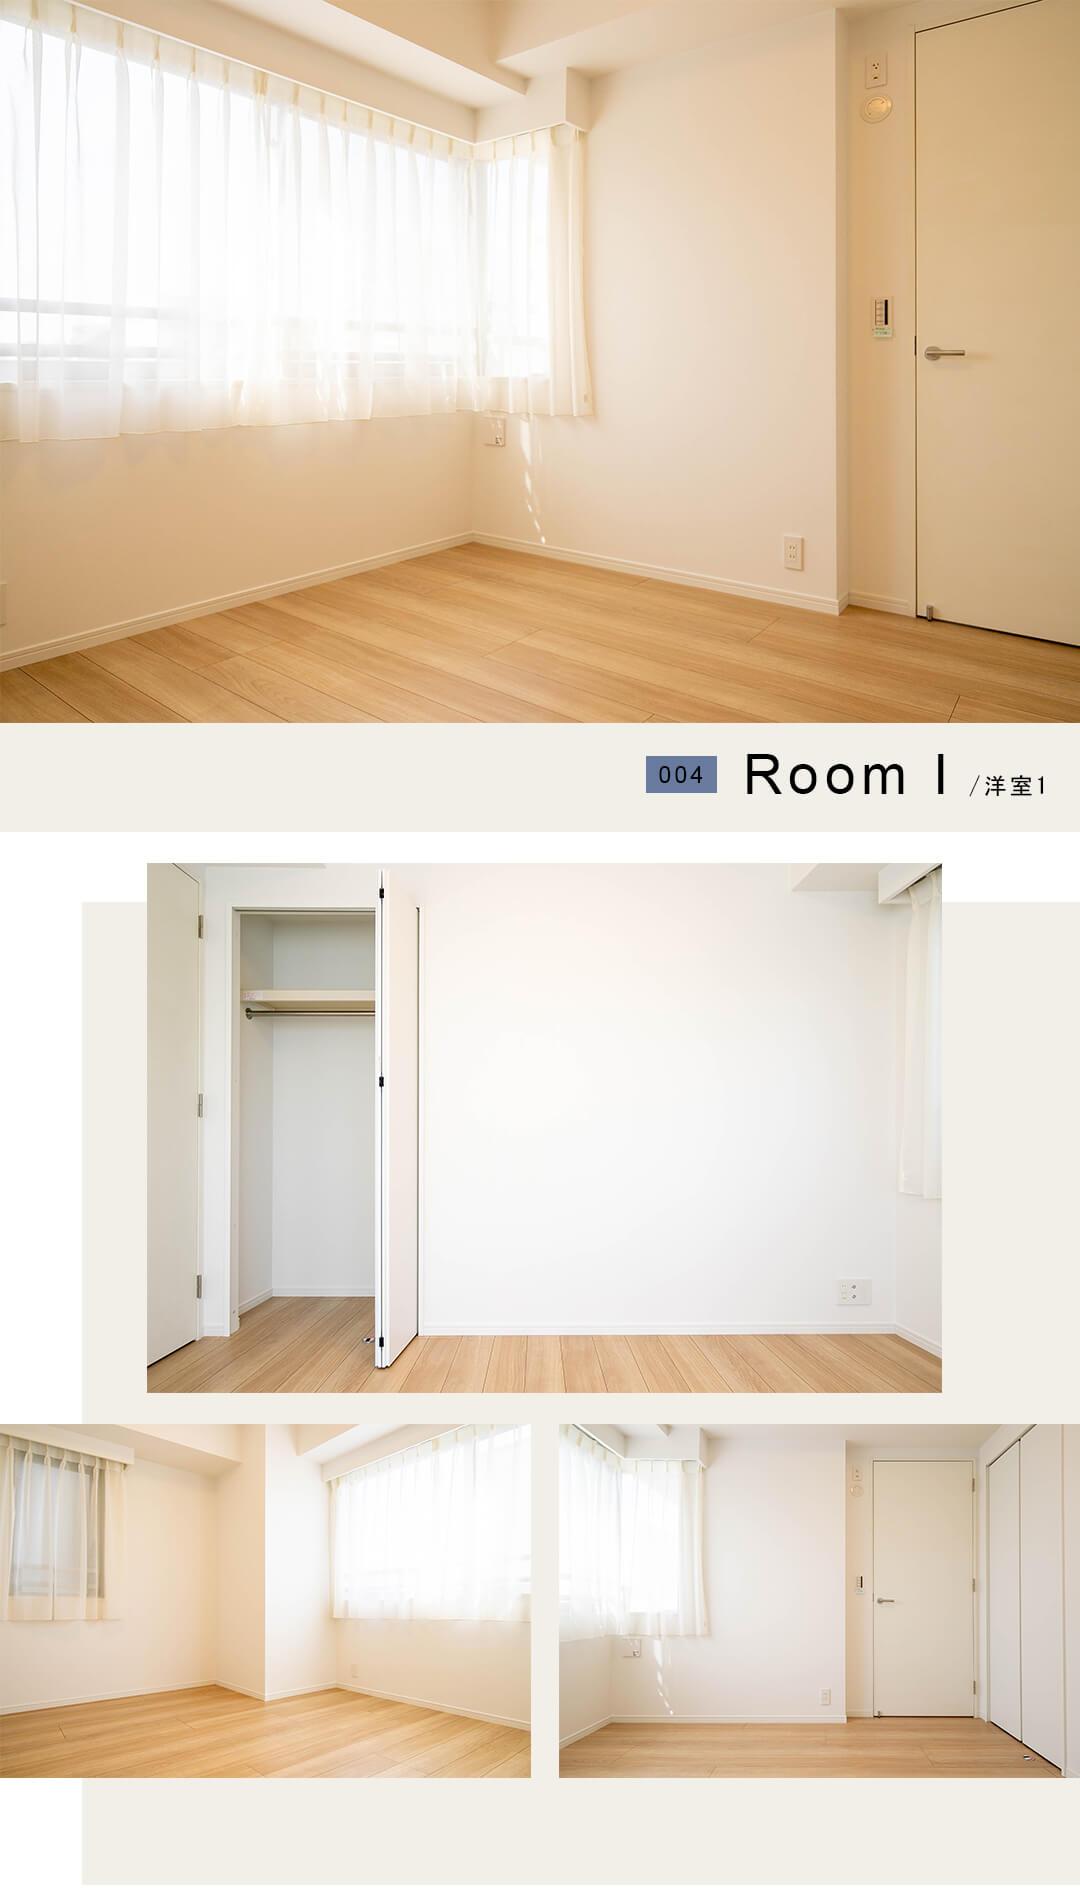 004,RoomI,洋室1